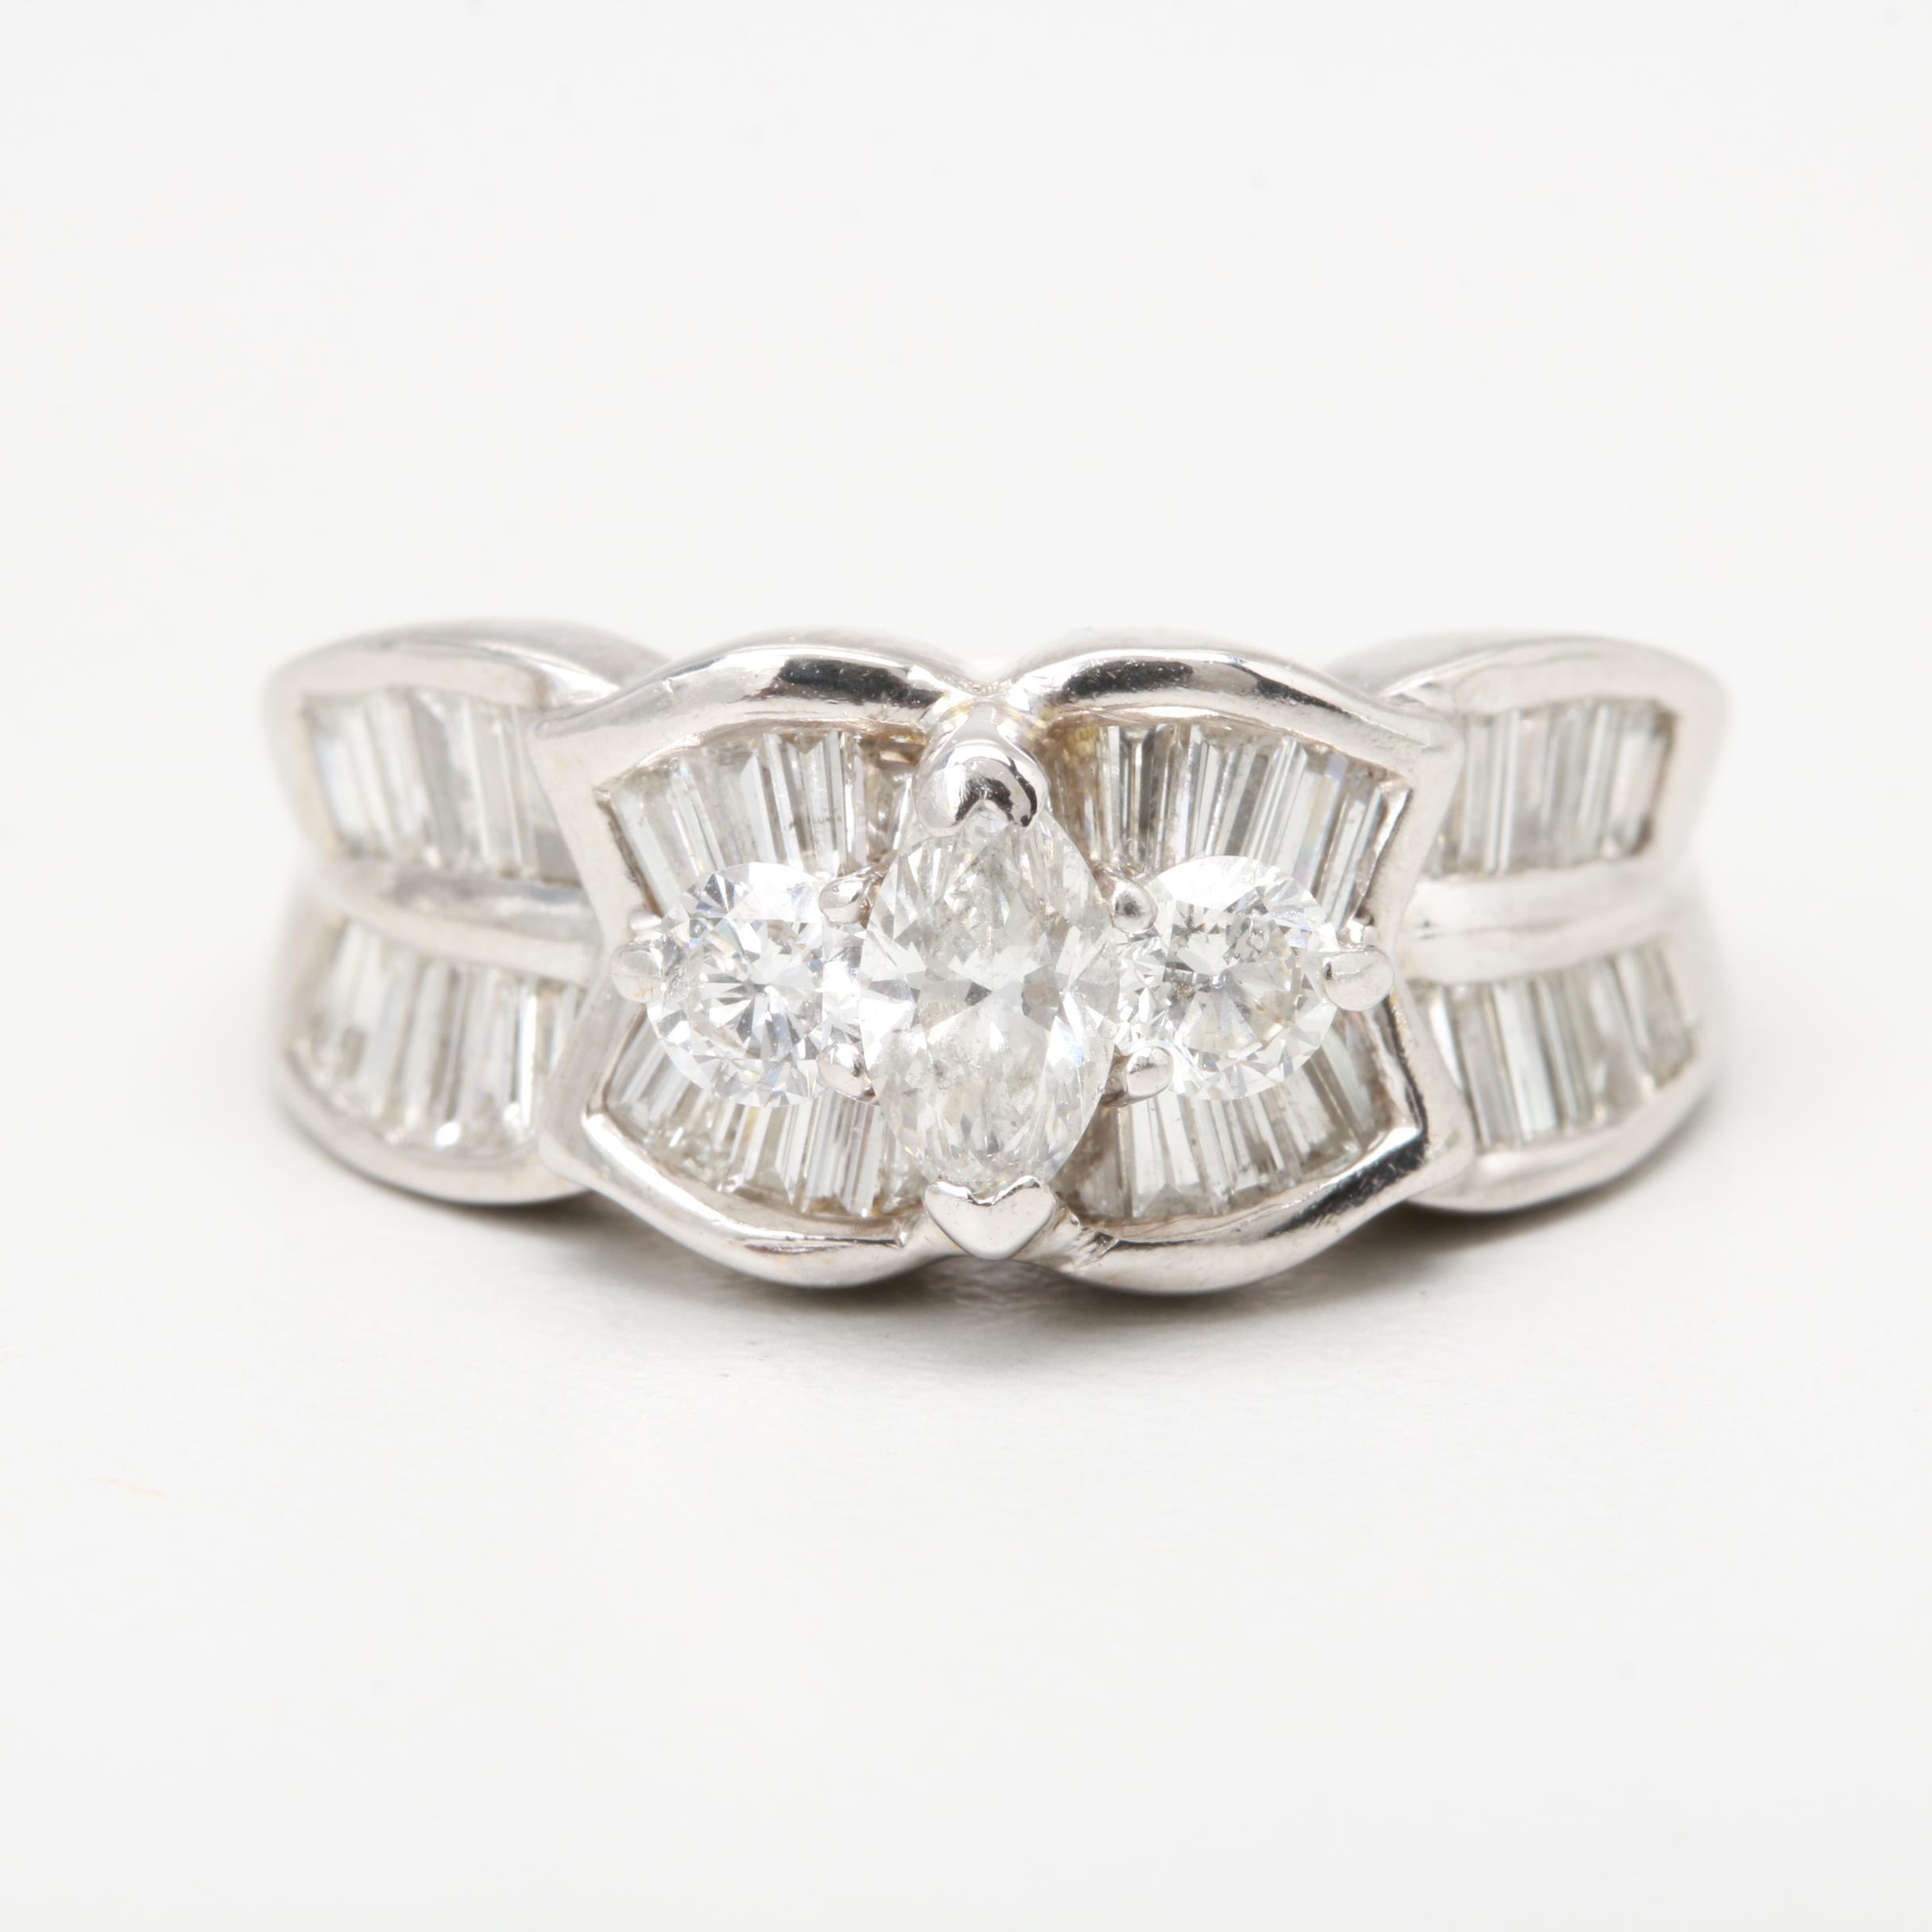 18K White Gold 1.51 CTW Diamond Ring